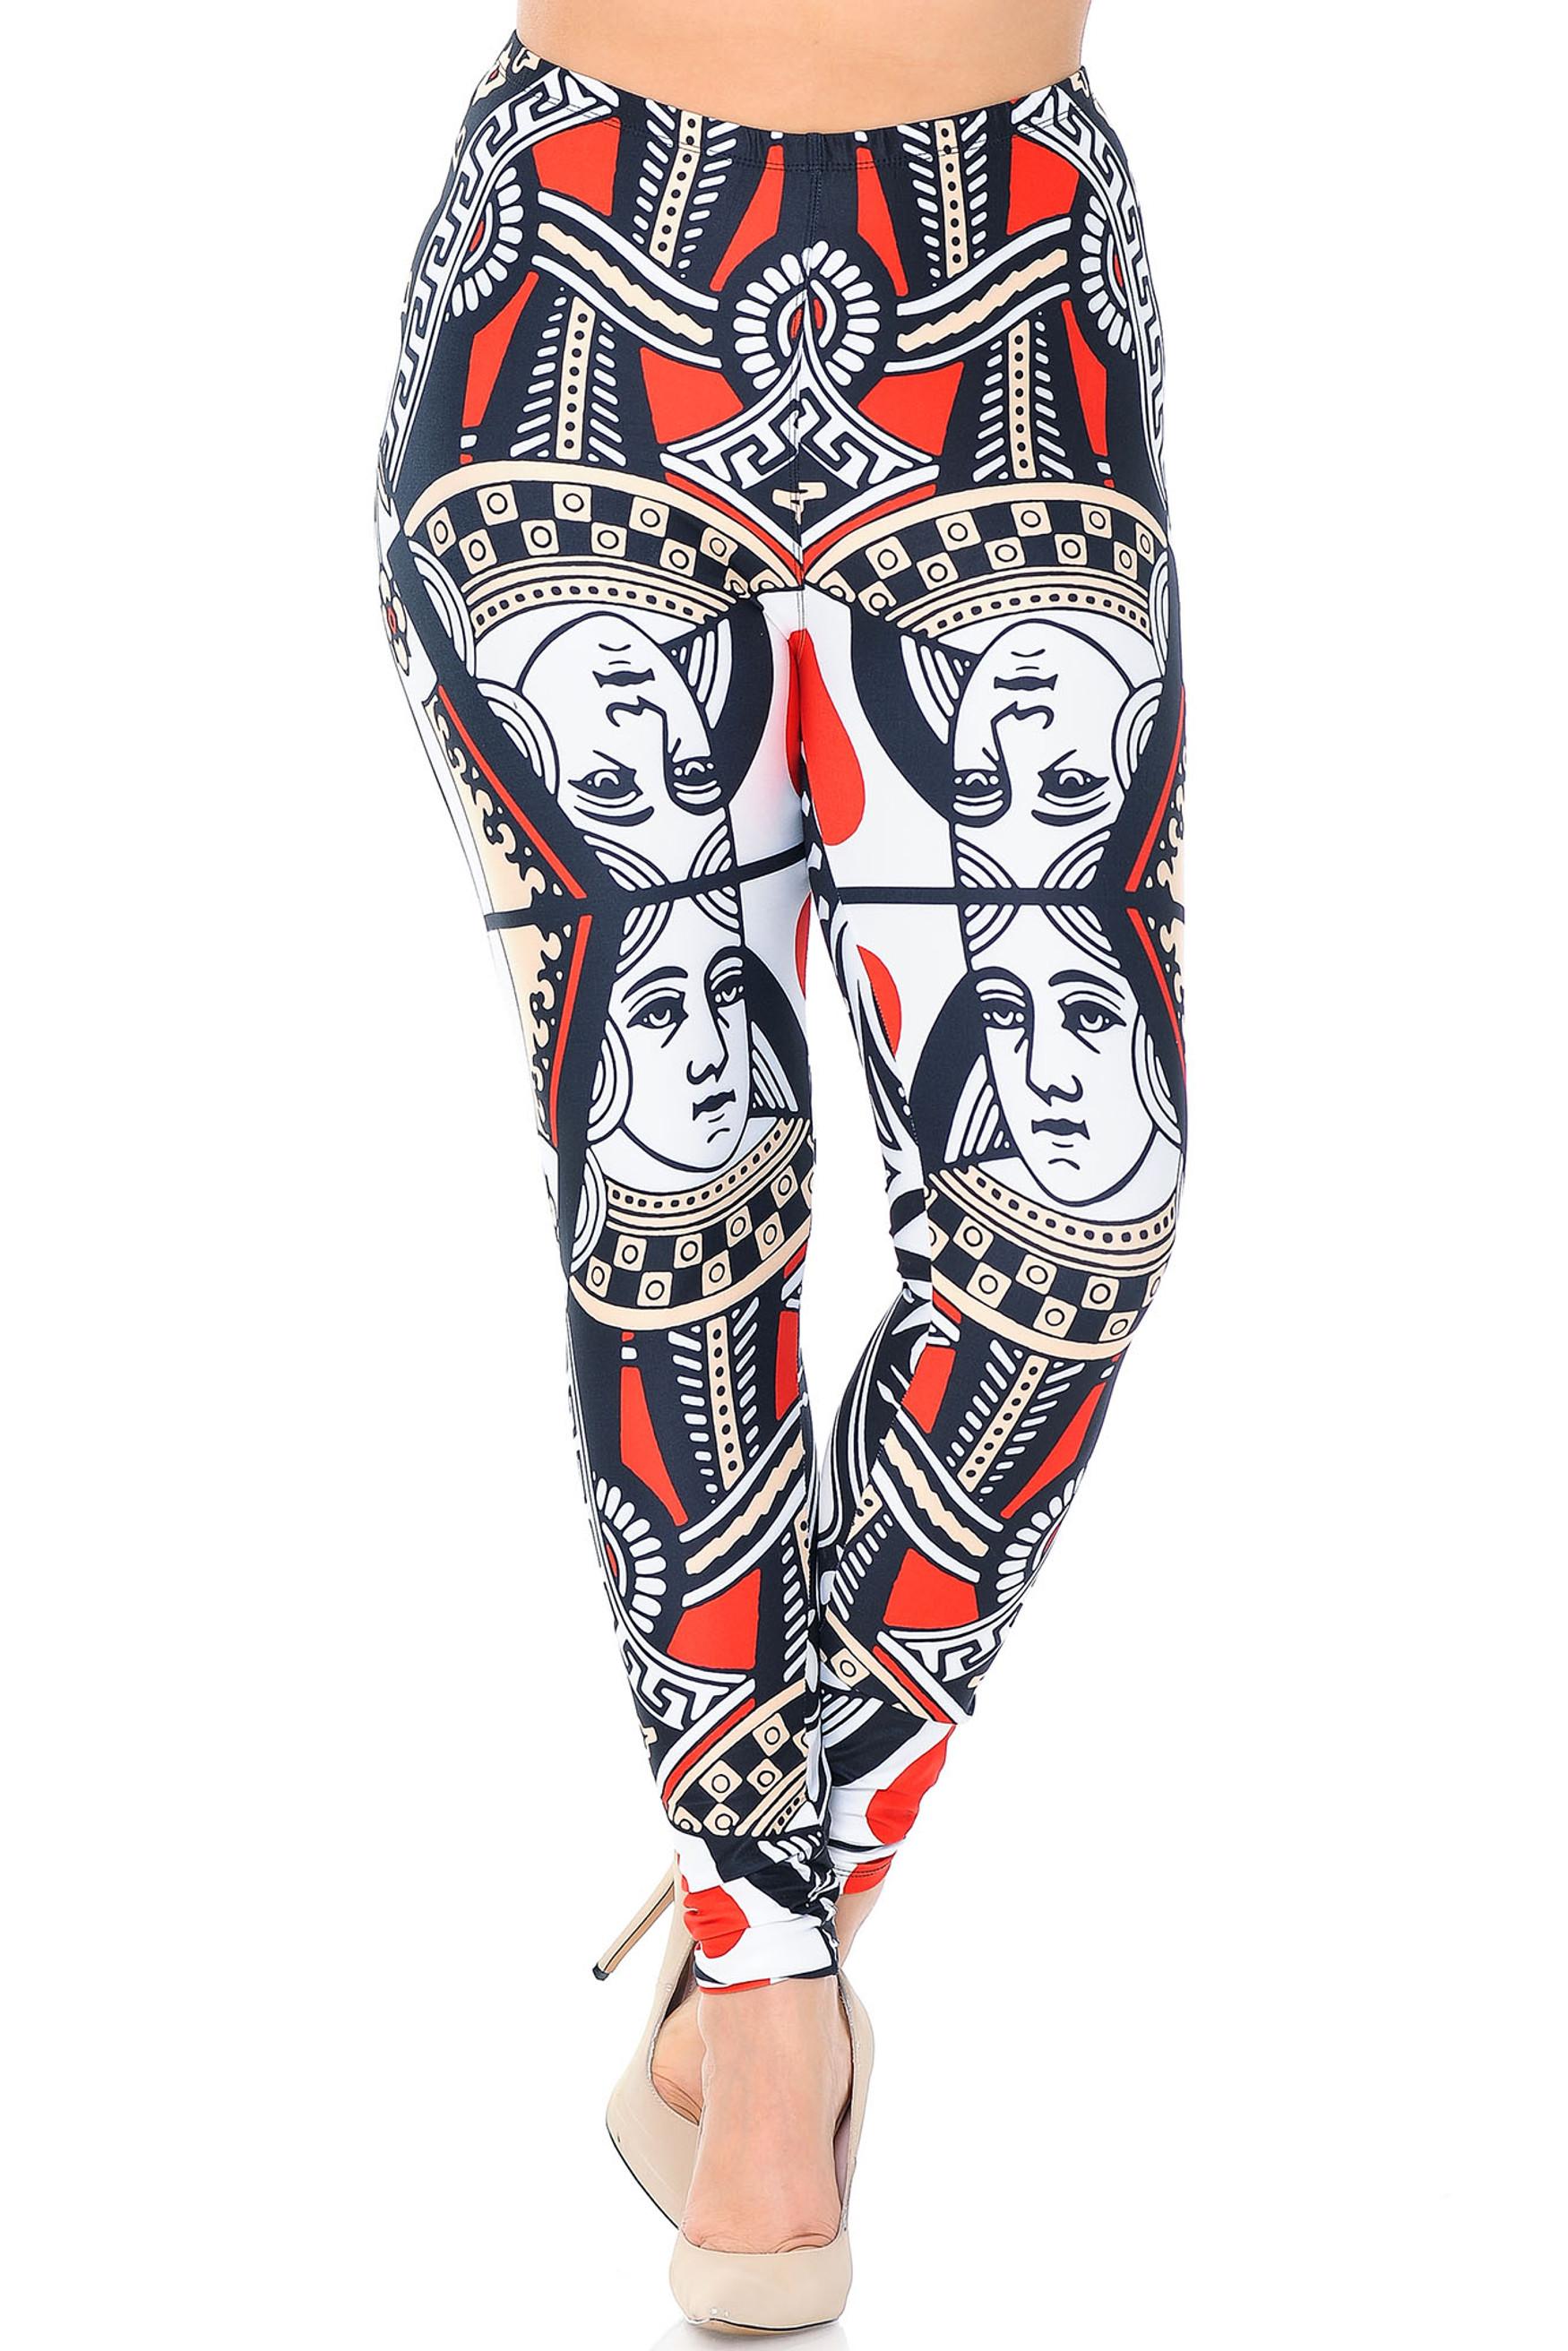 Creamy Soft Queen of Hearts Plus Size Leggings - USA Fashion™